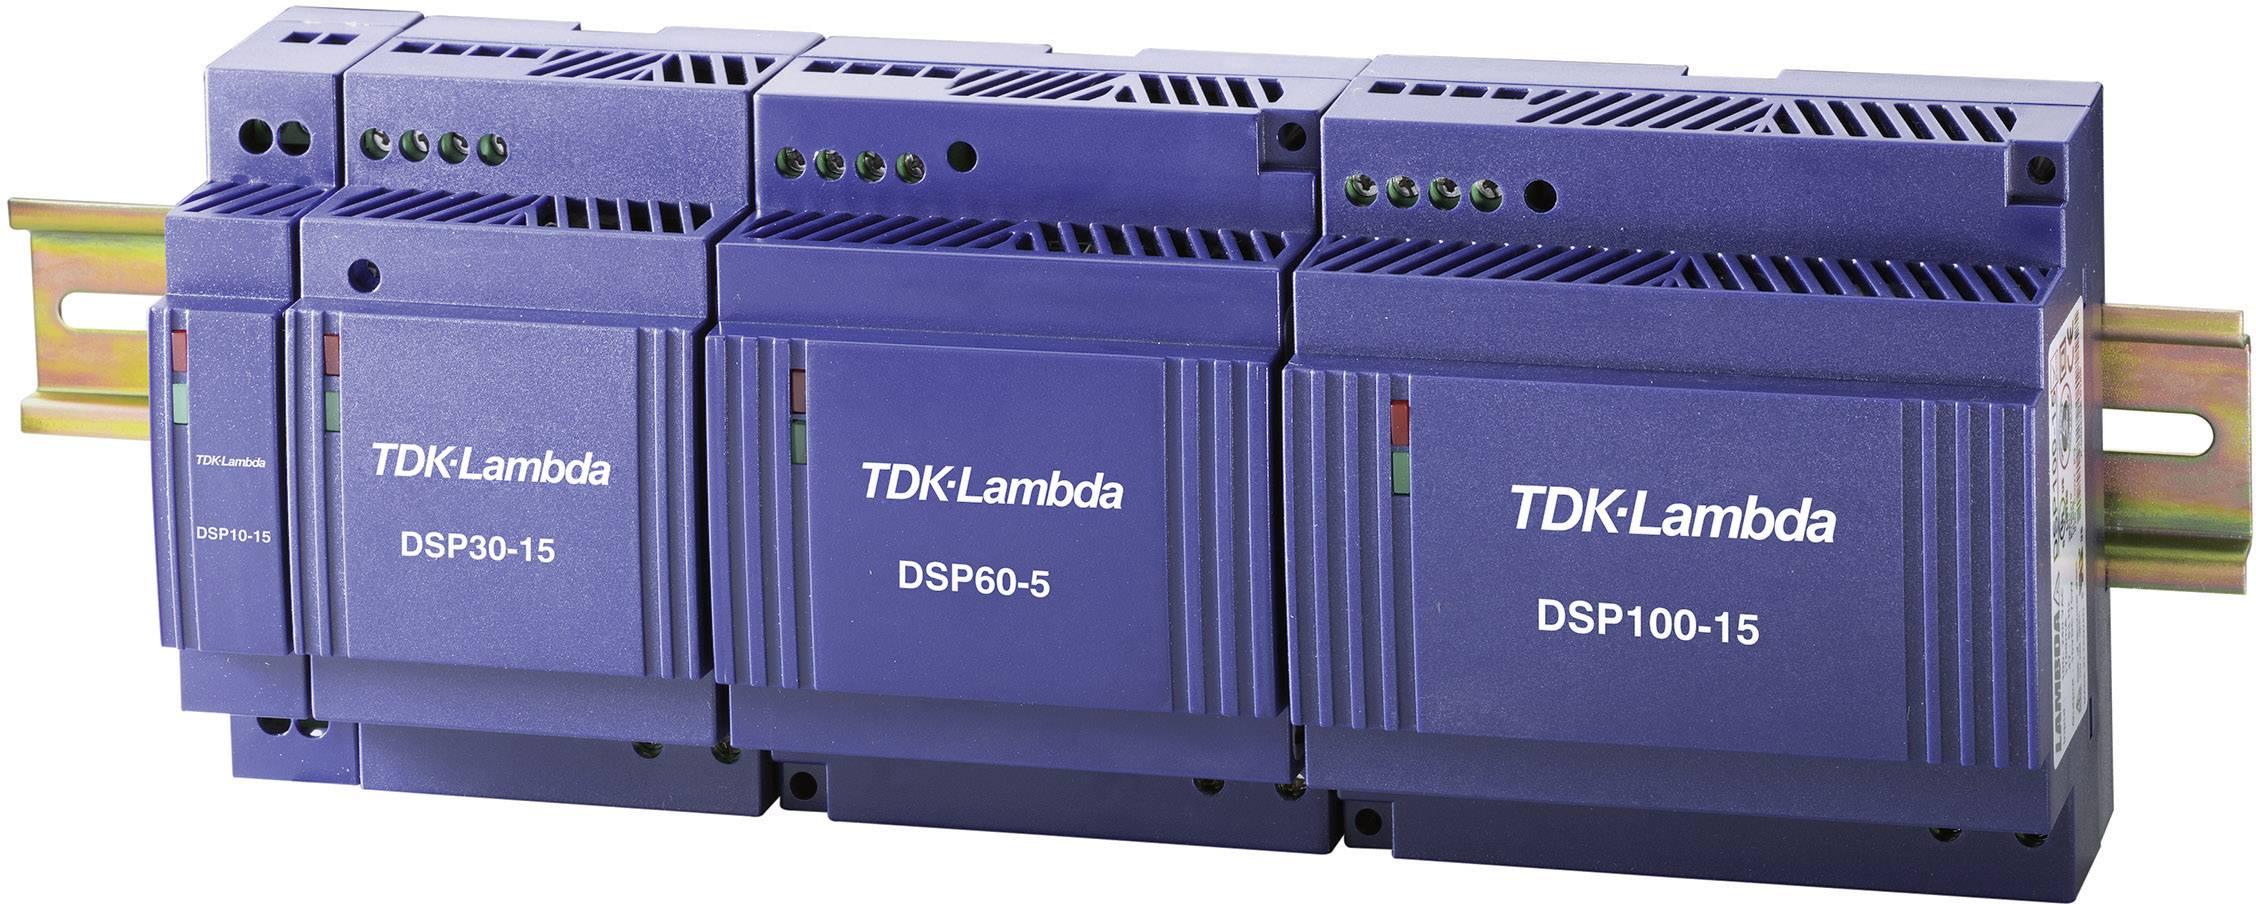 Sieťový zdroj na montážnu lištu (DIN lištu) TDK-Lambda DSP-10-24, 1 x, 24 V/DC, 0.42 A, 10.1 W